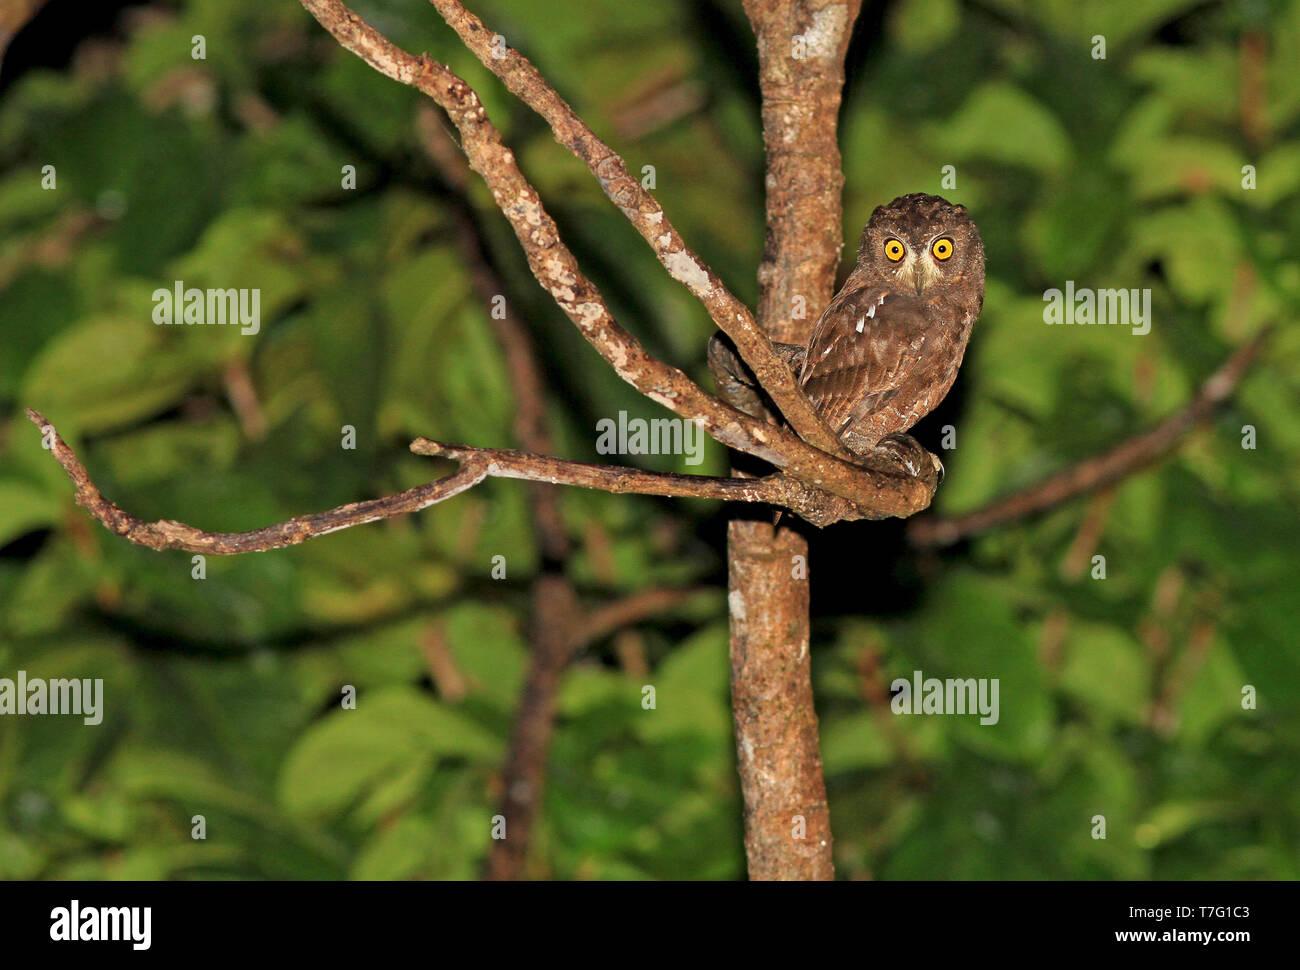 Enggano Scops Owl Otus Enganensis At Night In Rain Forests Of Sumatra In Indonesia Stock Photo Alamy